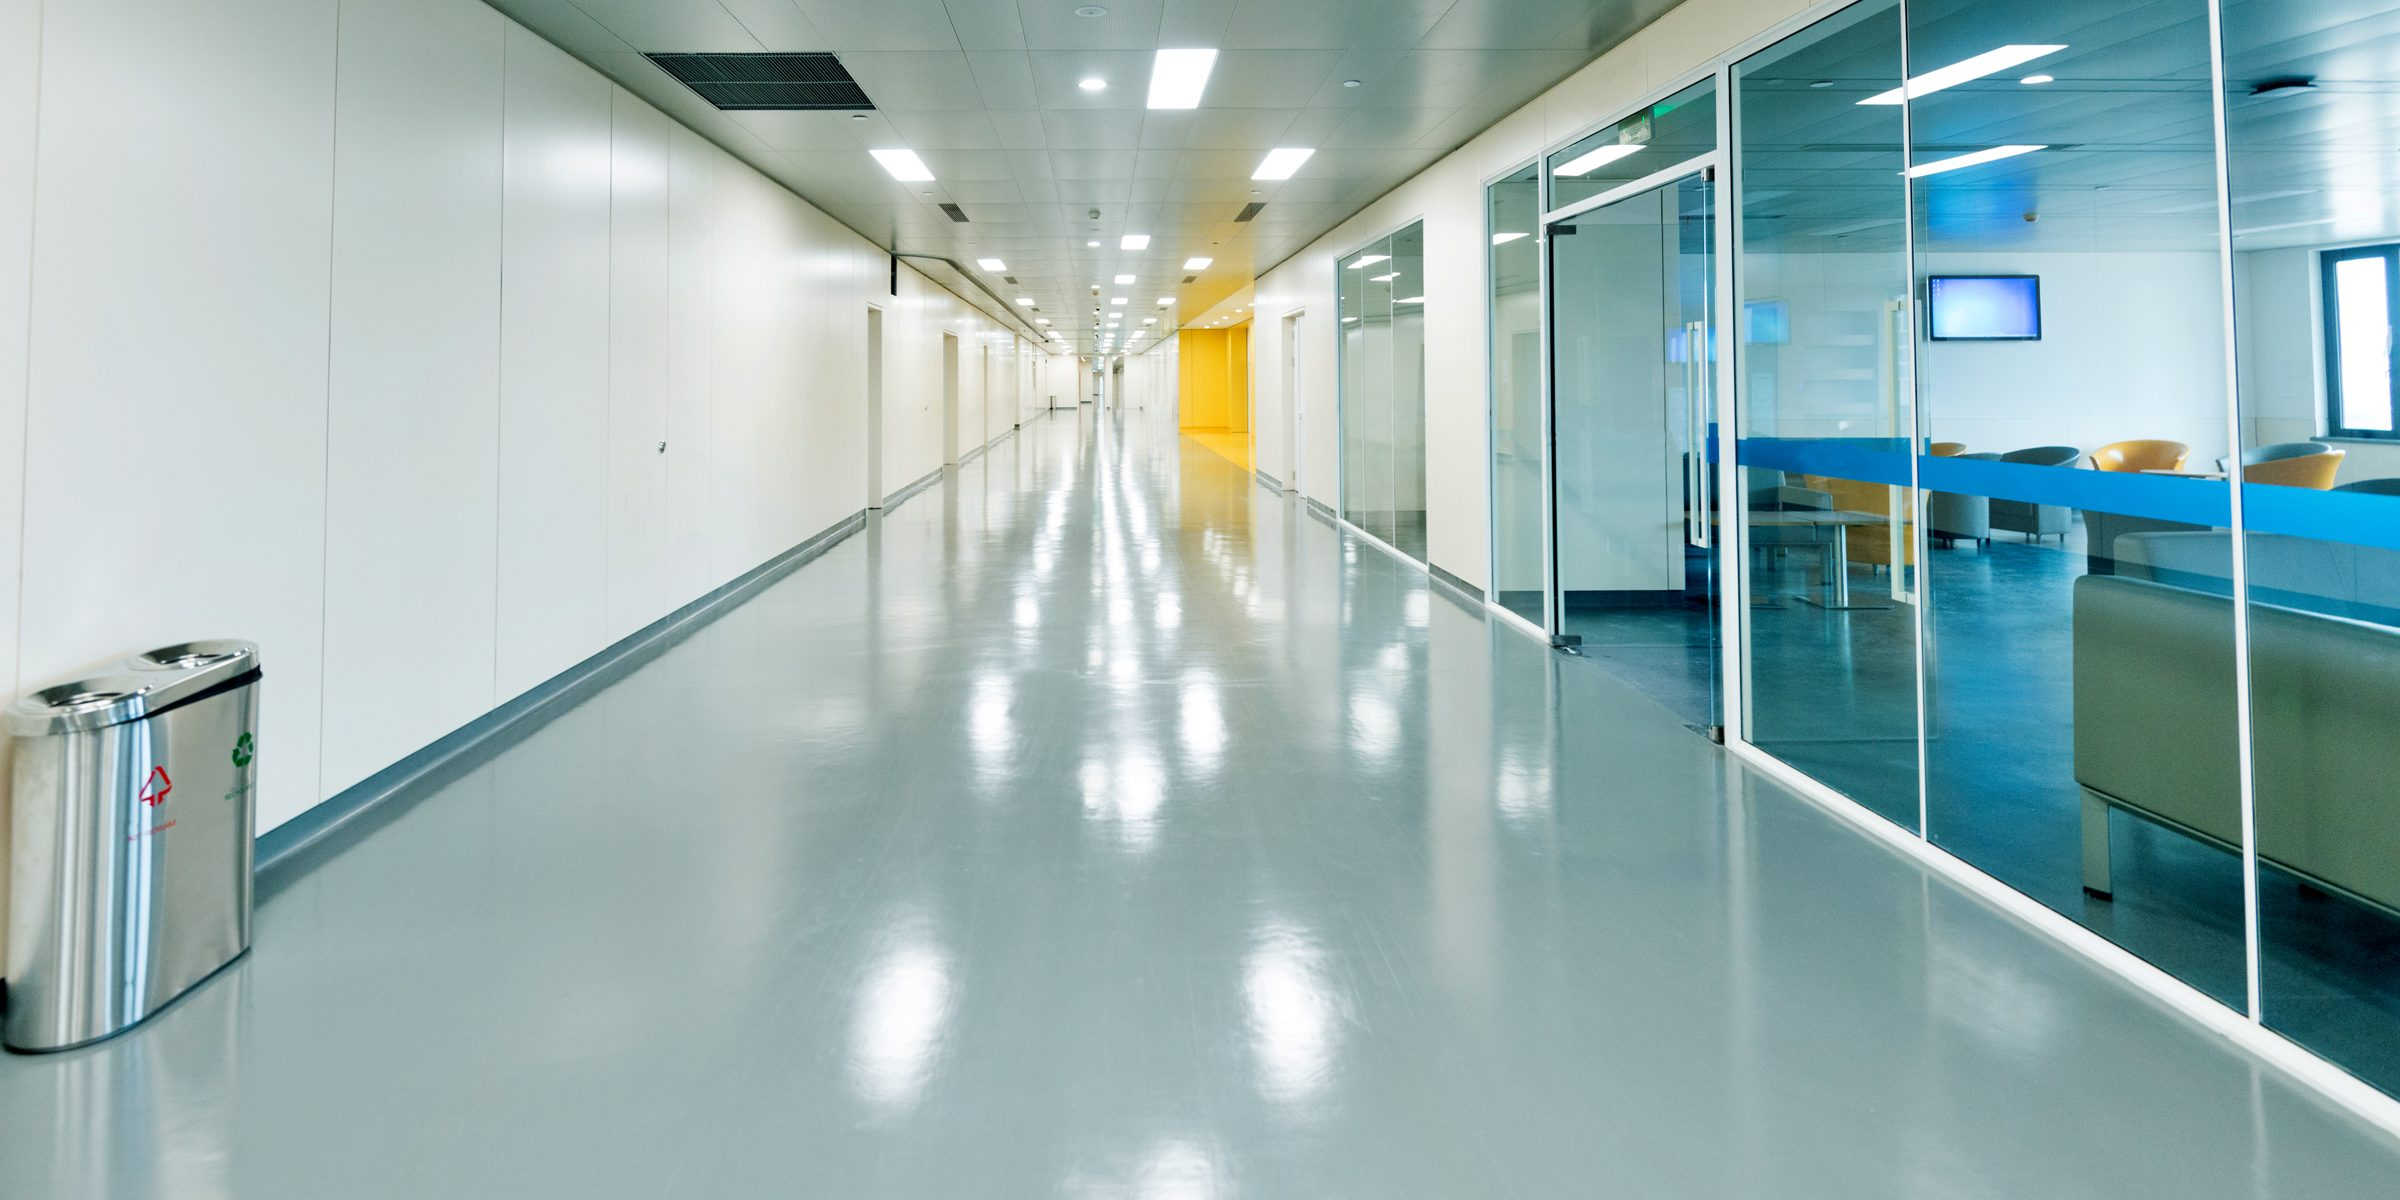 Empty corridor in a hospital.